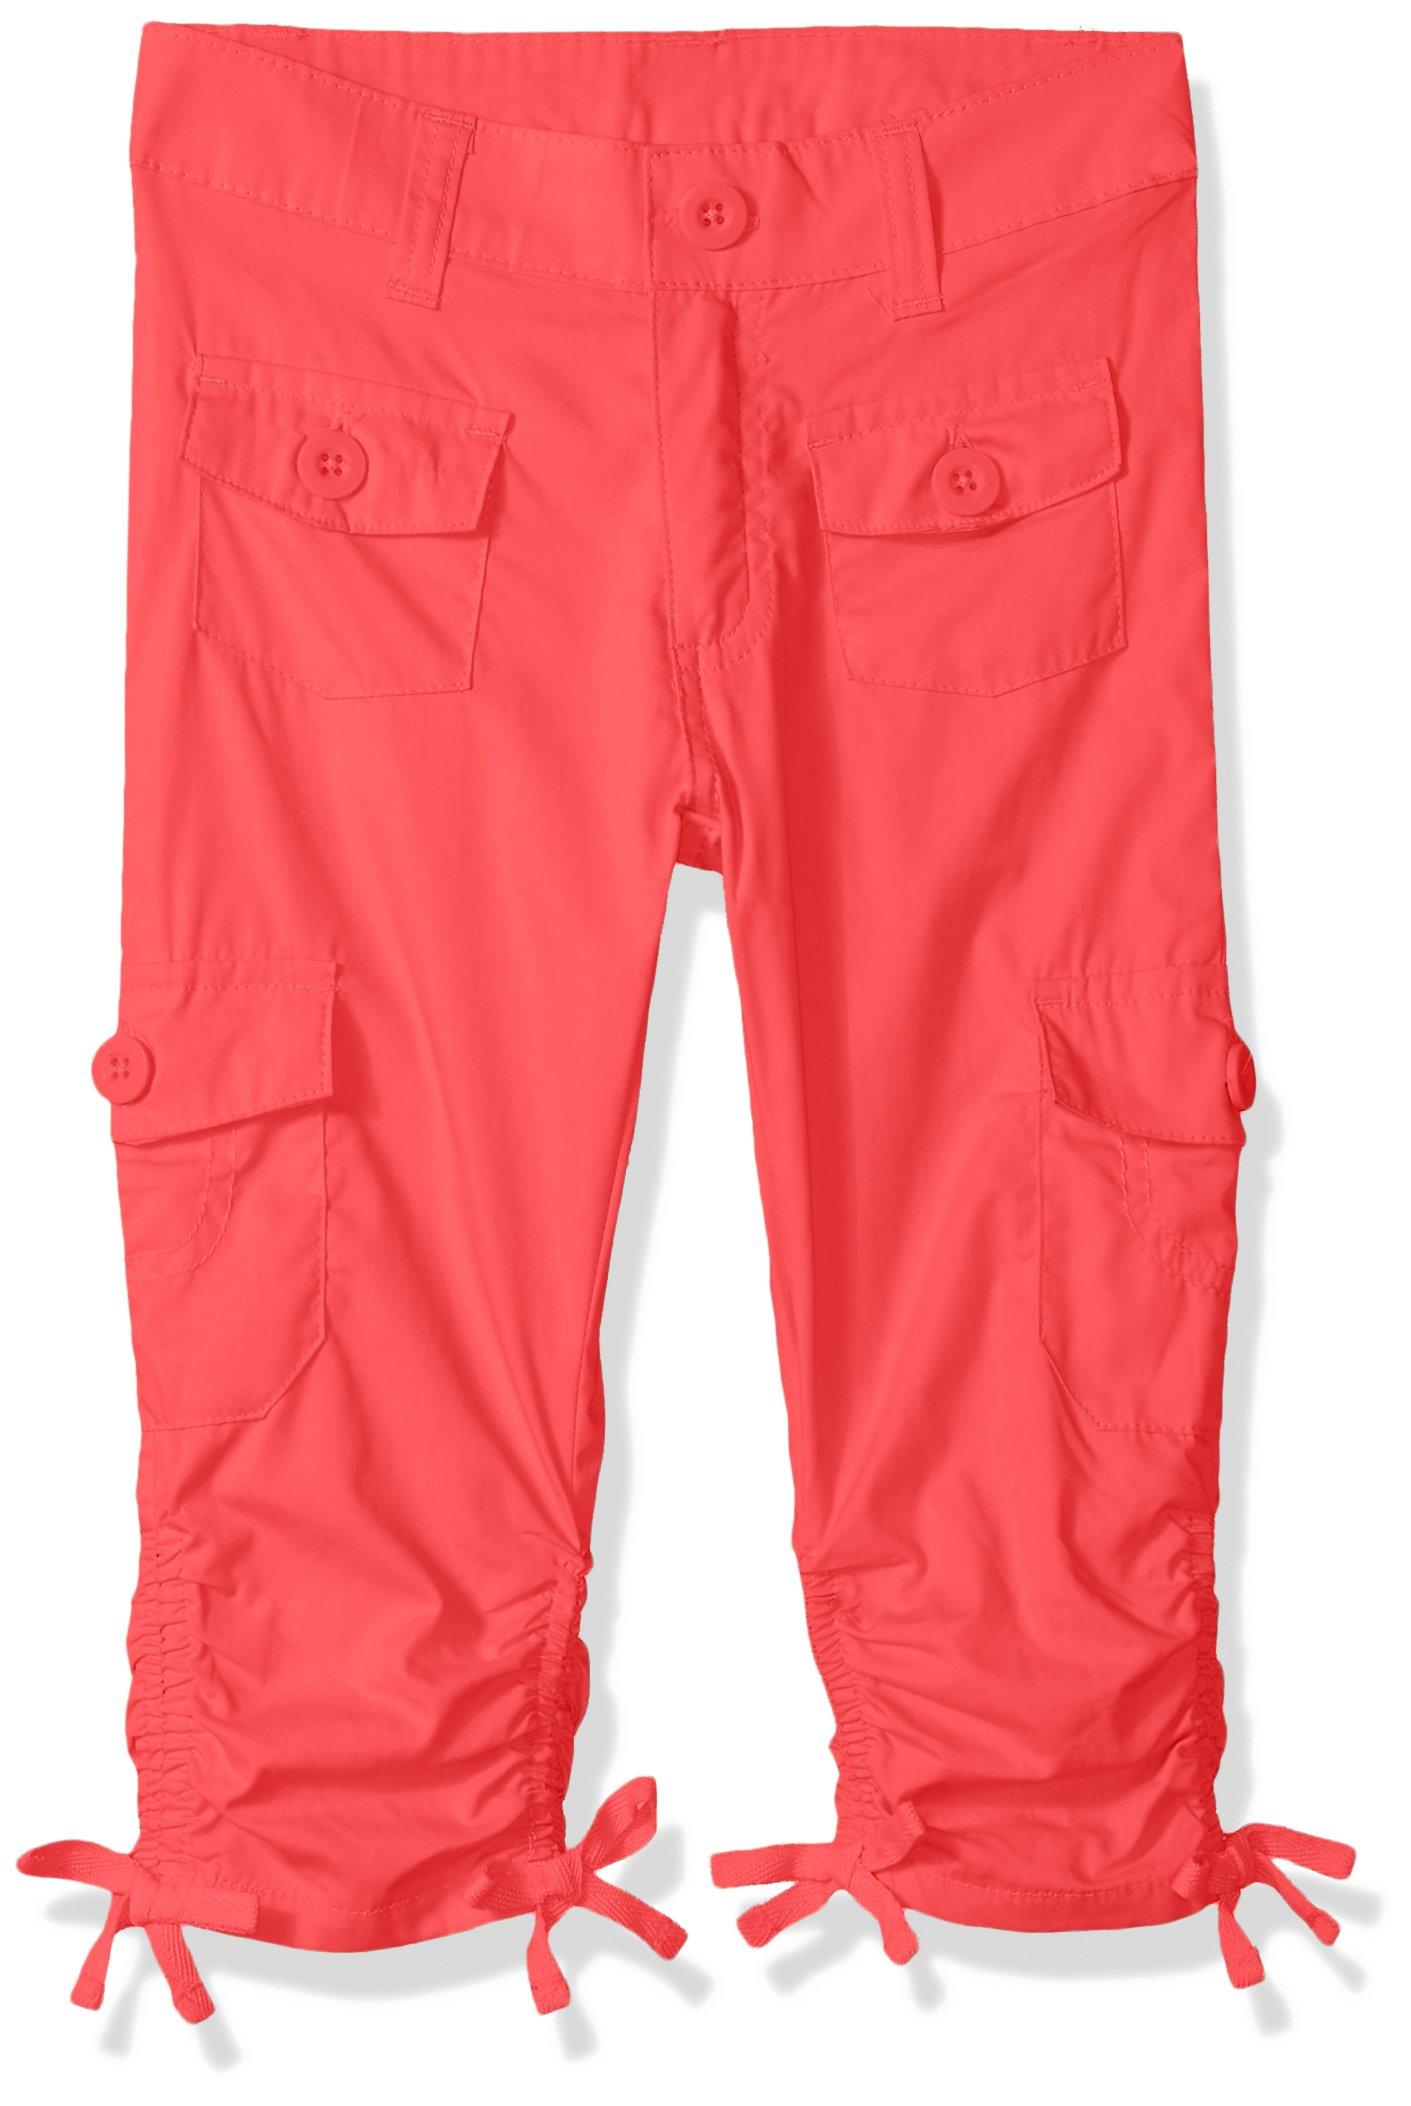 Limited Too Toddler Girls' Fleece Pant, Scrunchy Hem Poplin Cargo Capri Coral, 4T